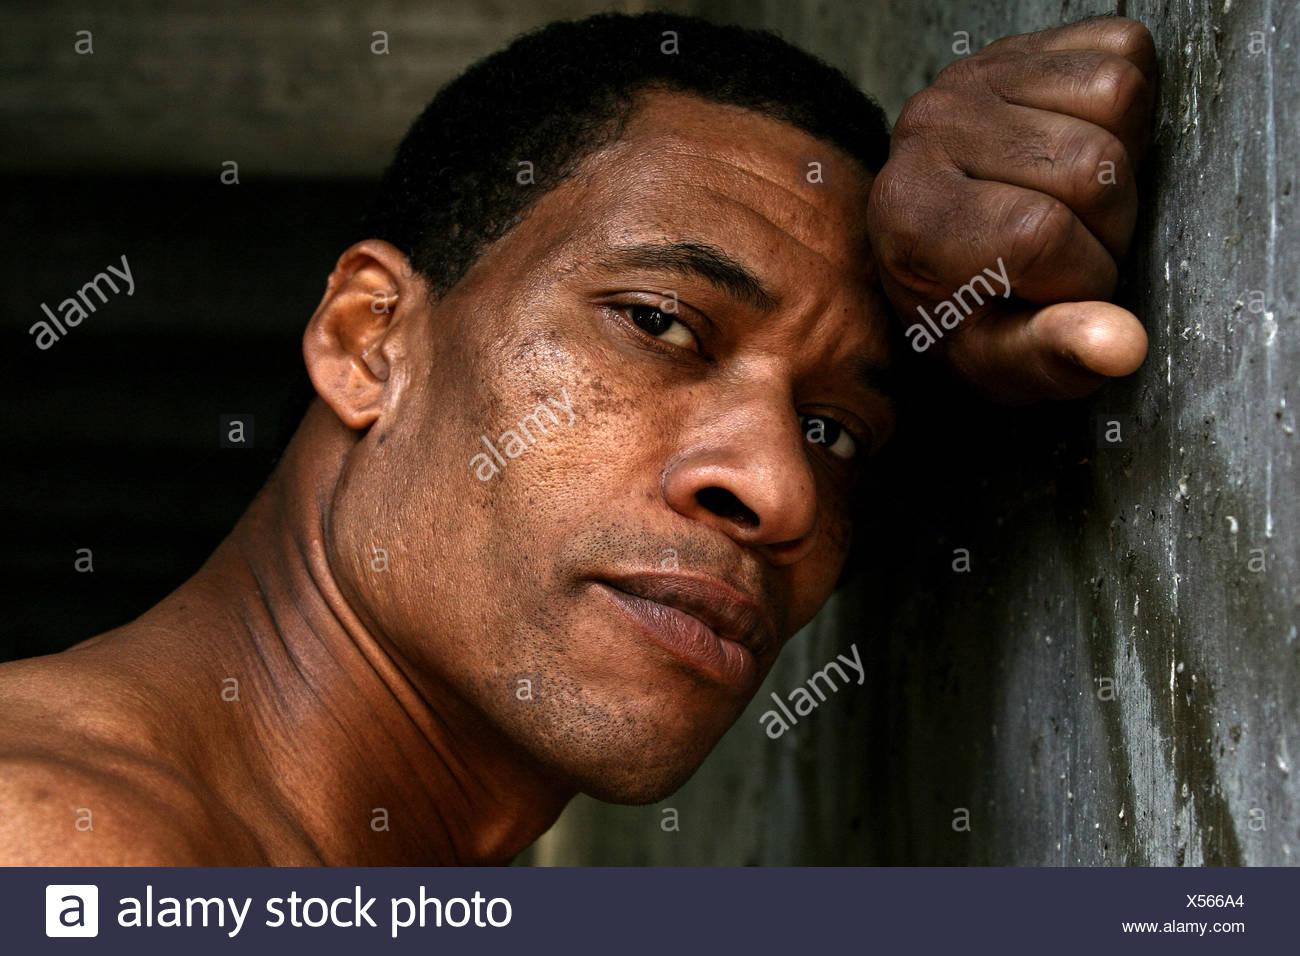 Hombre,agotado,retrato Imagen De Stock